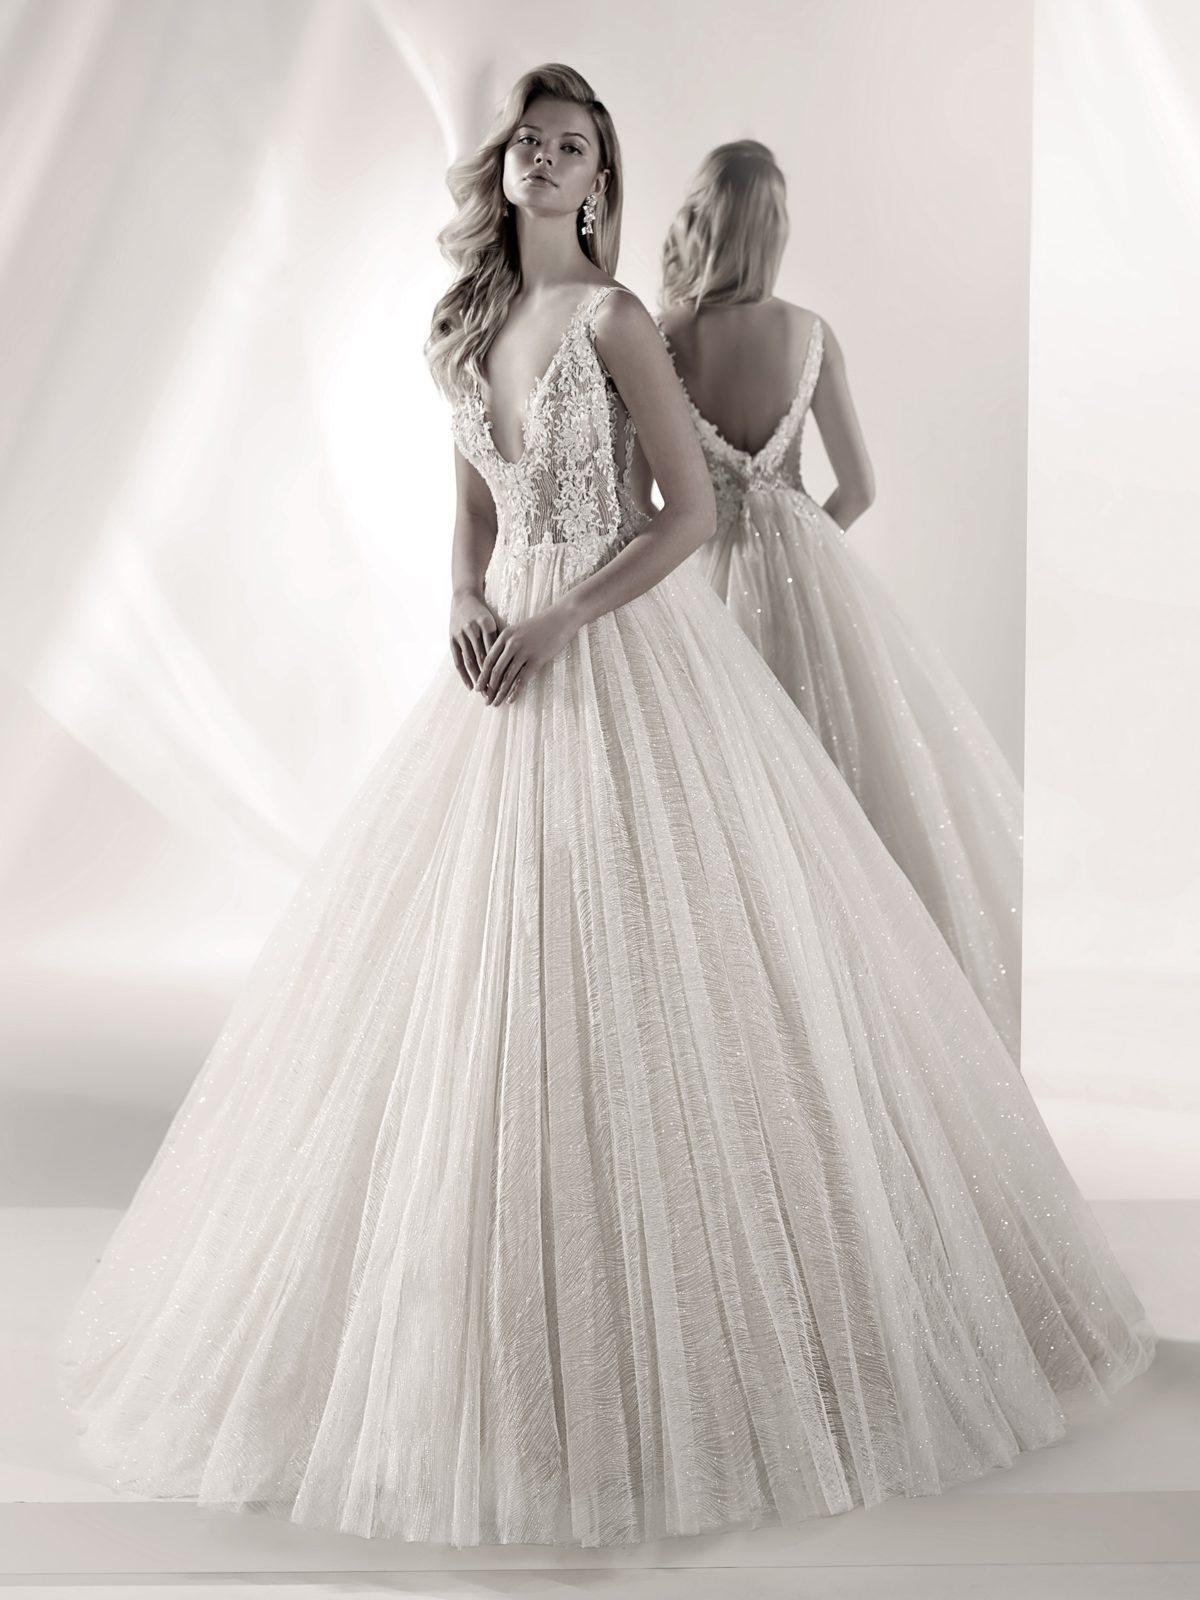 Nicole-Luxury-0001-01